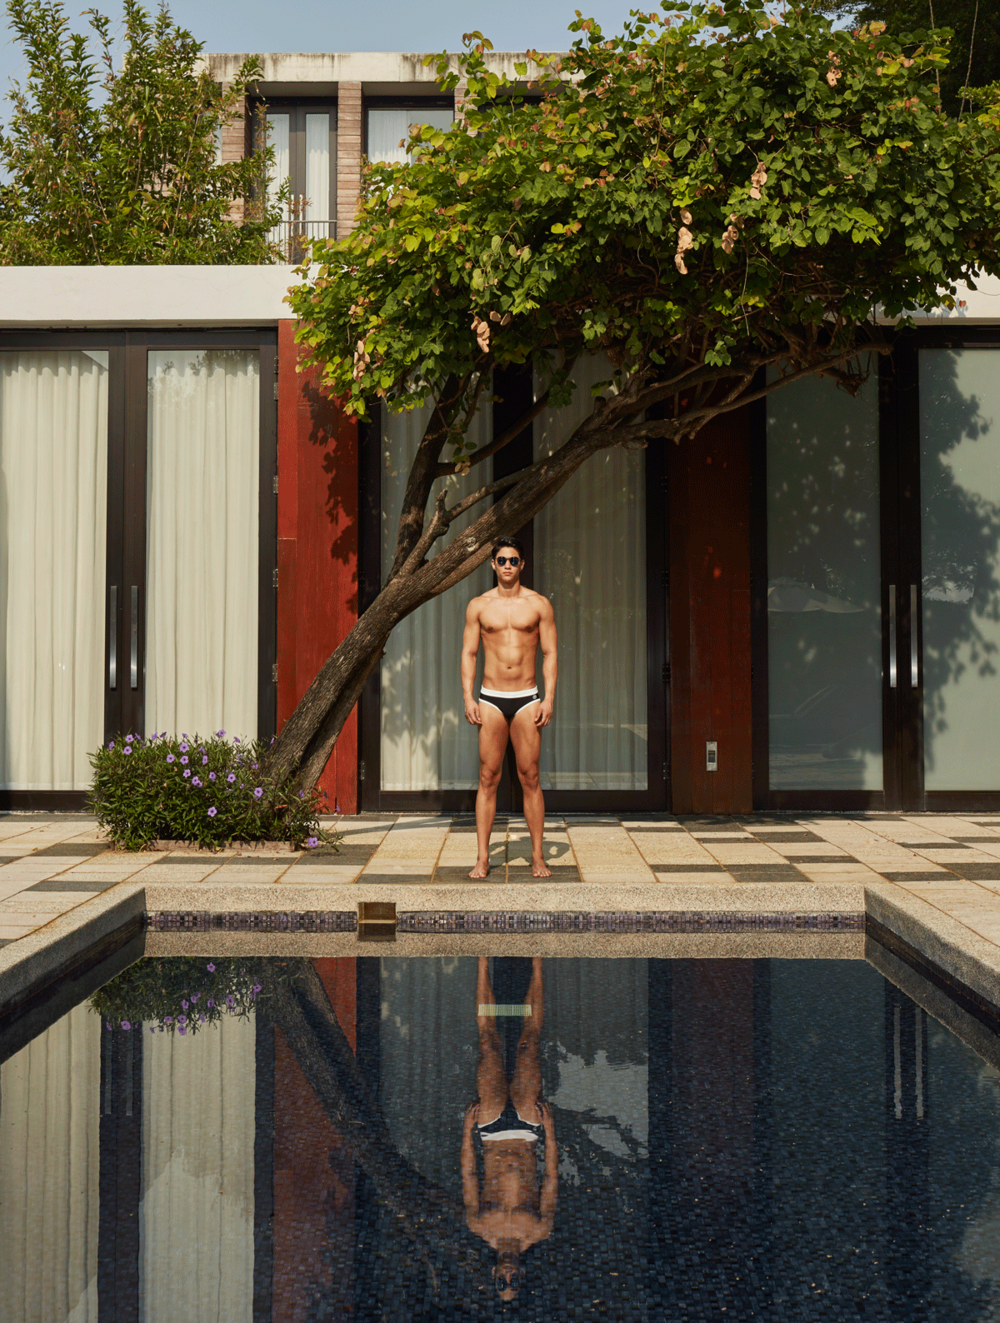 swimwear : NOXX / sunglasses : TAVAT